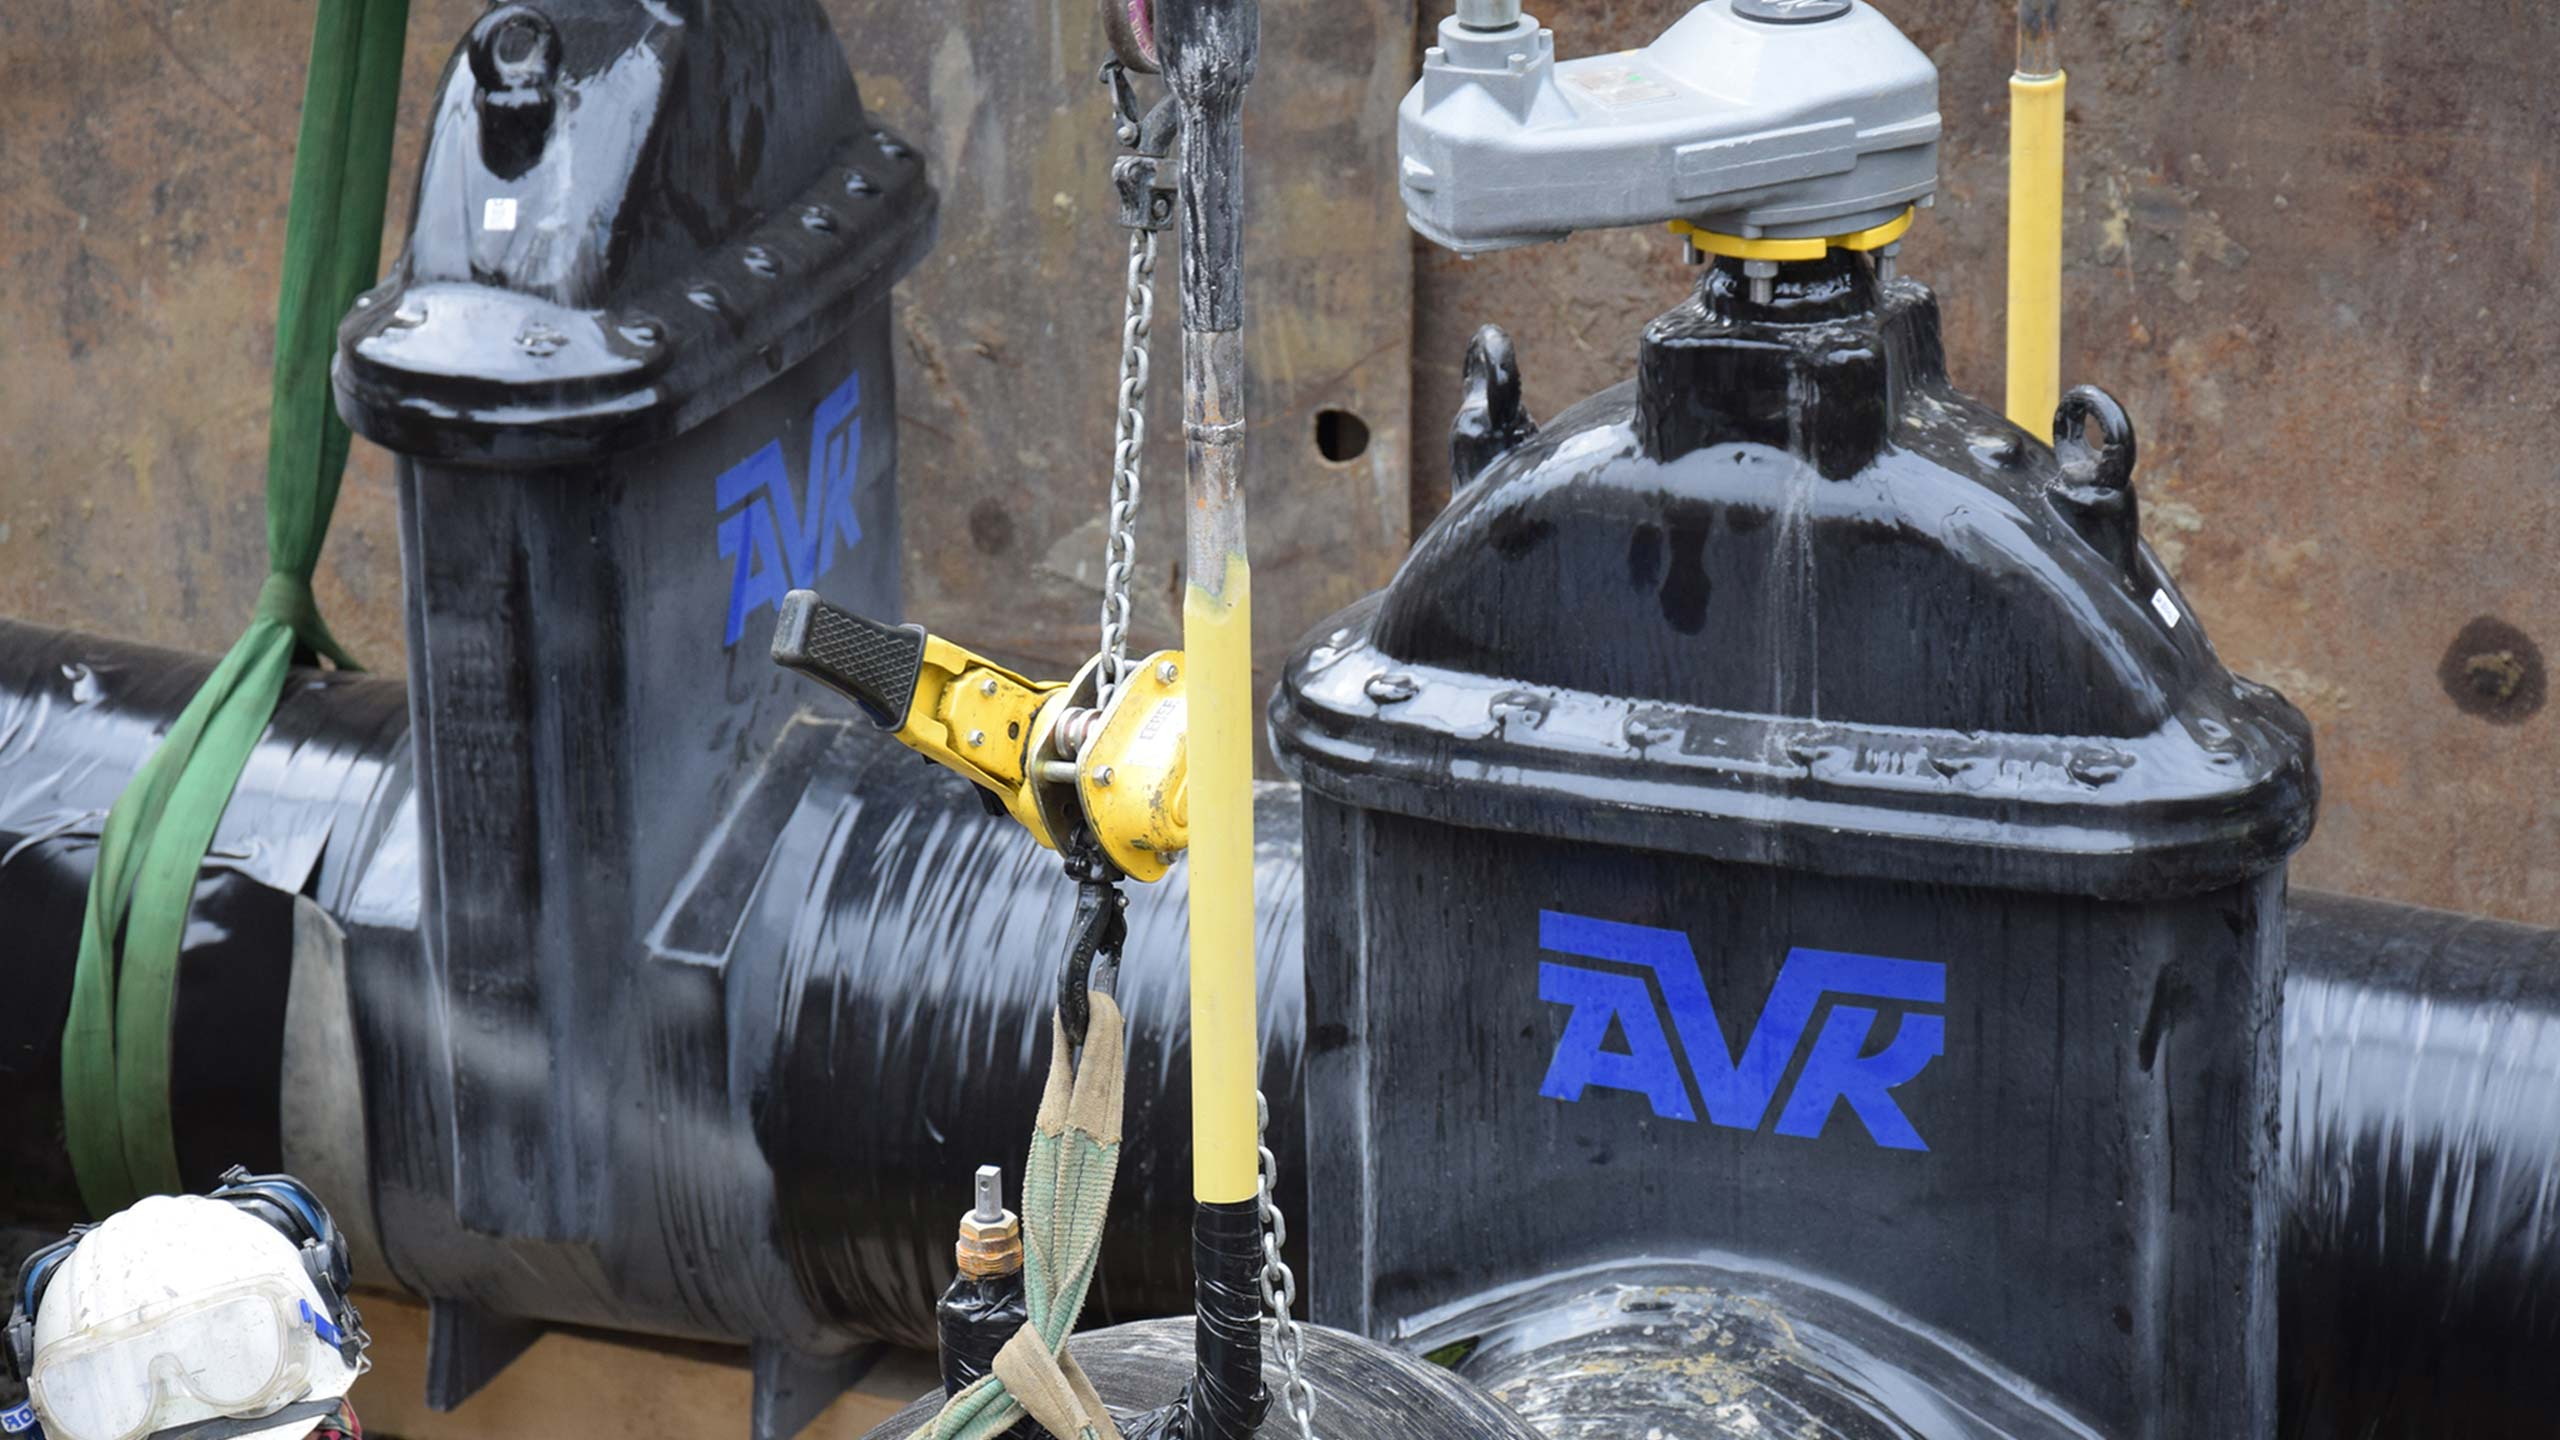 AVK-gasafsluiters DN 500 voor nieuwe gasleiding in kader van verbreding Albertkanaal